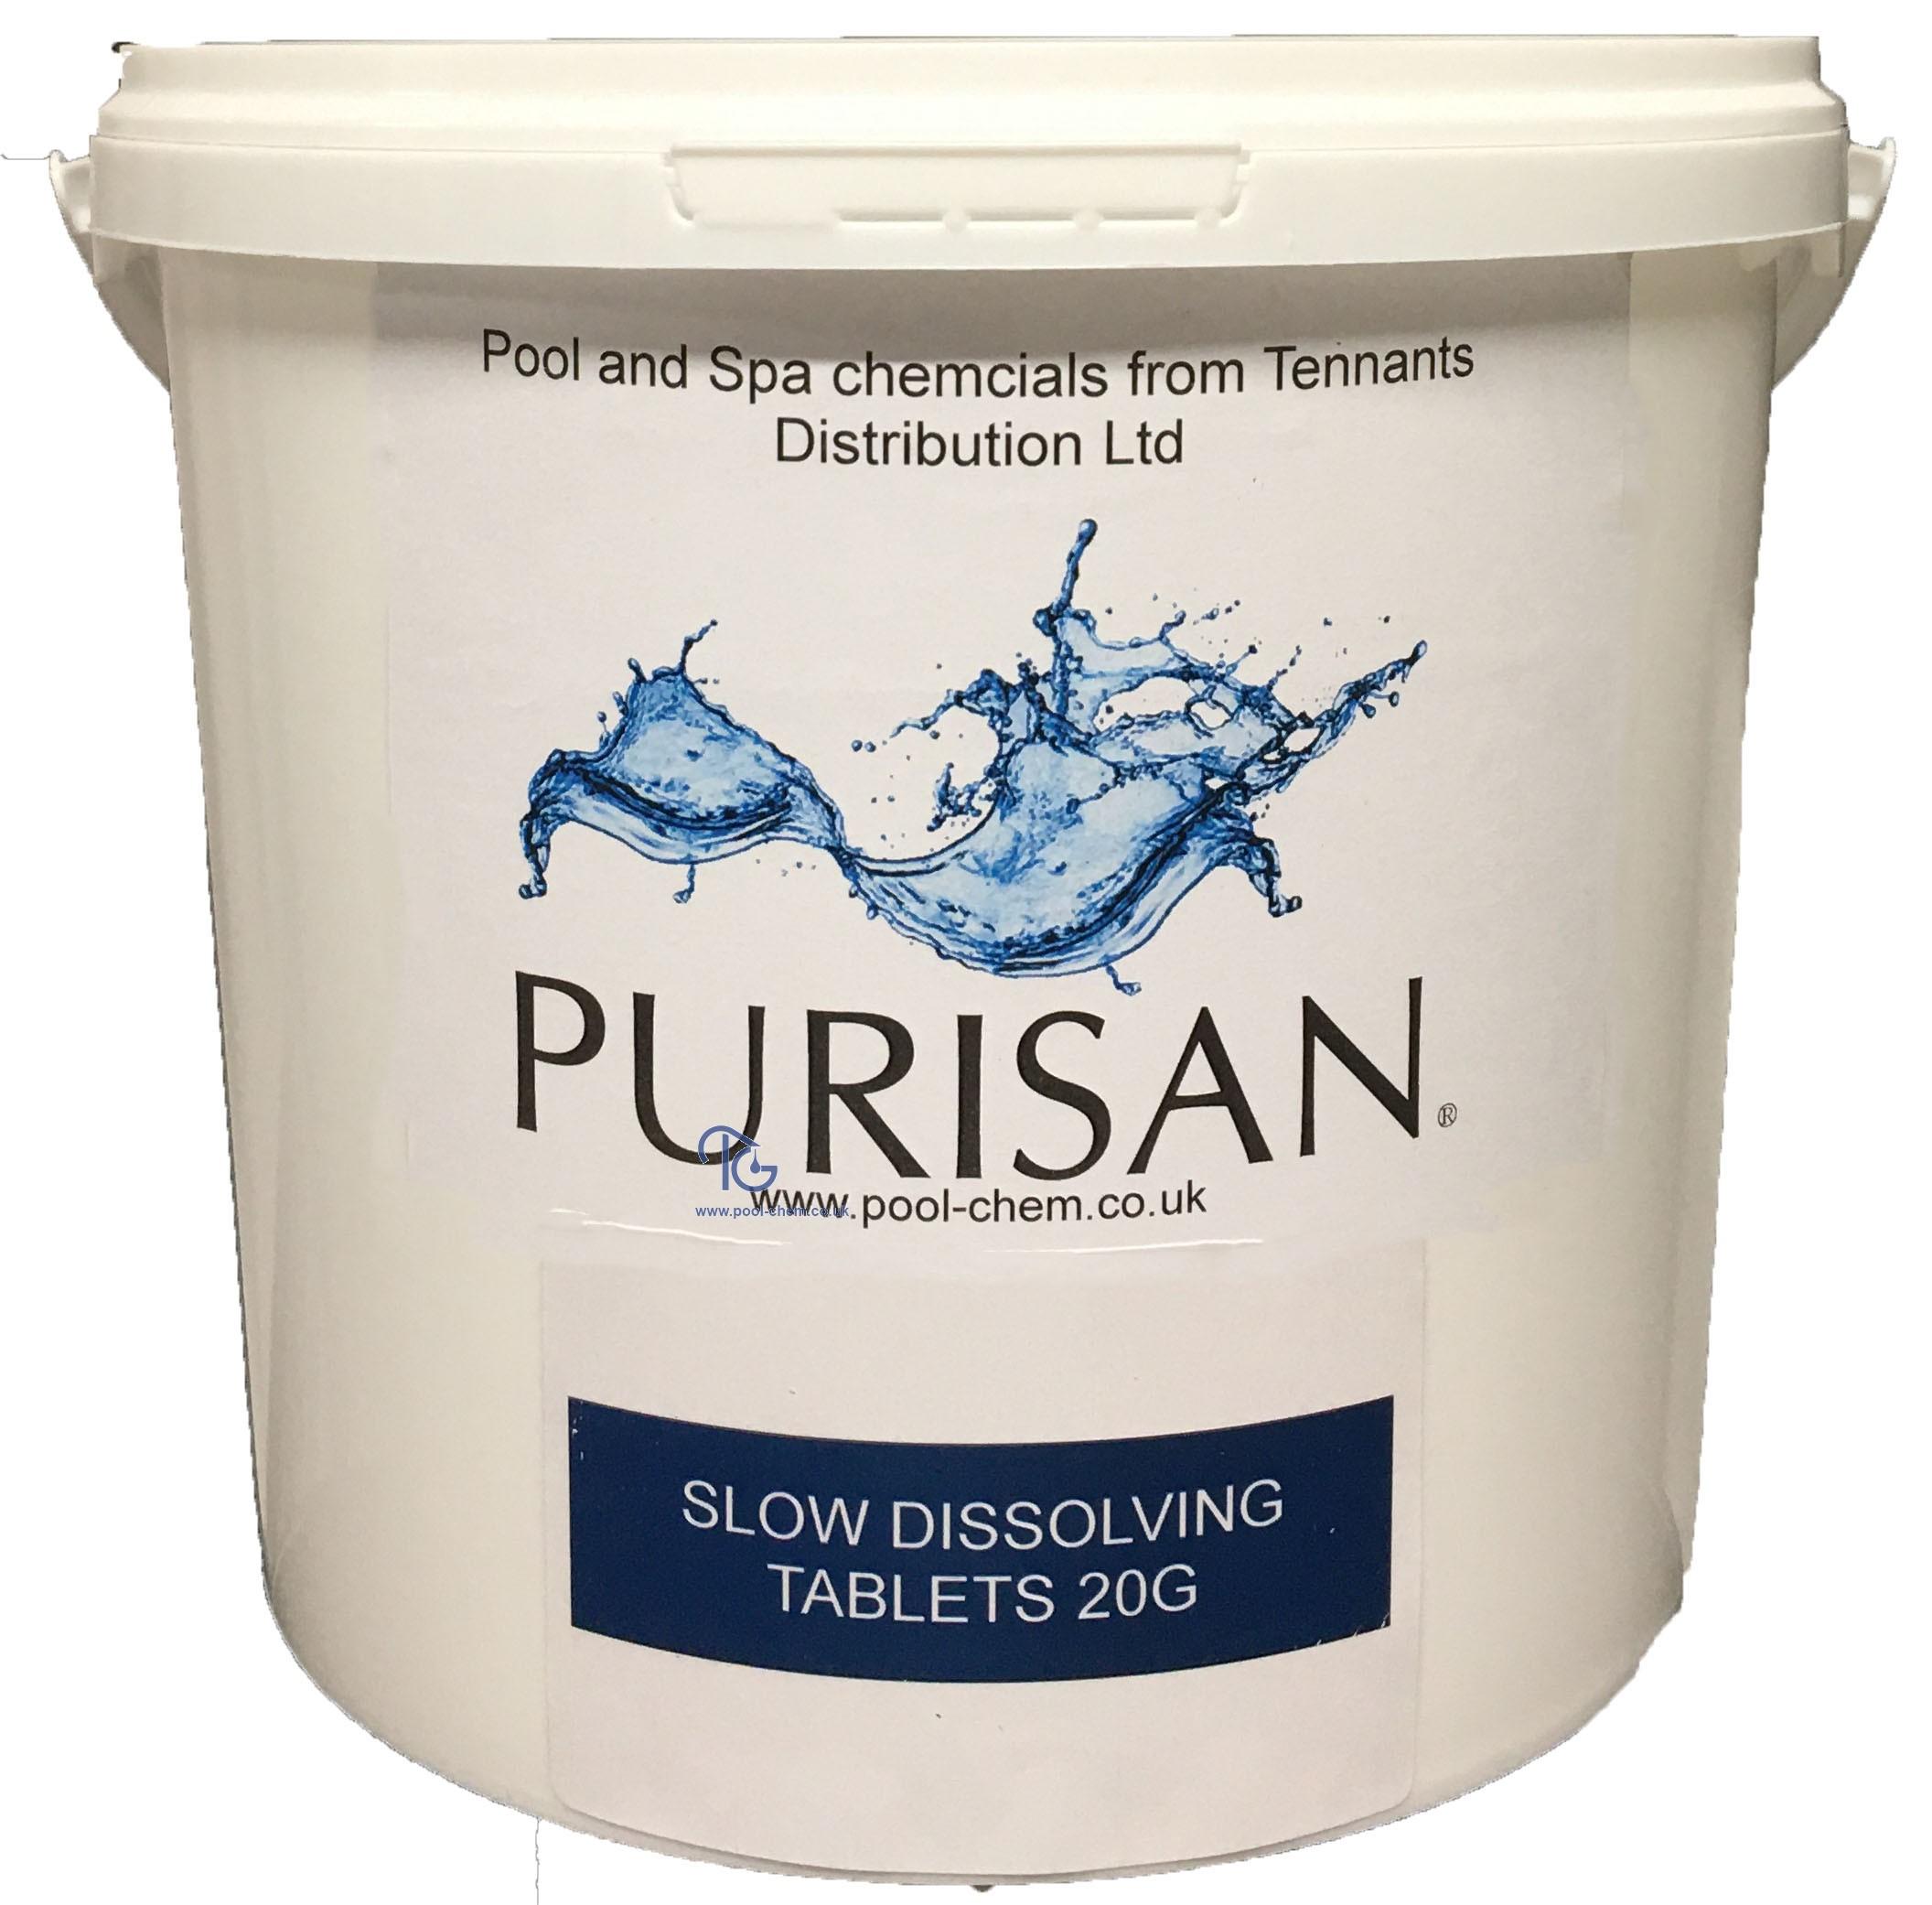 Purisan 20g Mini Slow Dissolving Stabilised Chlorine